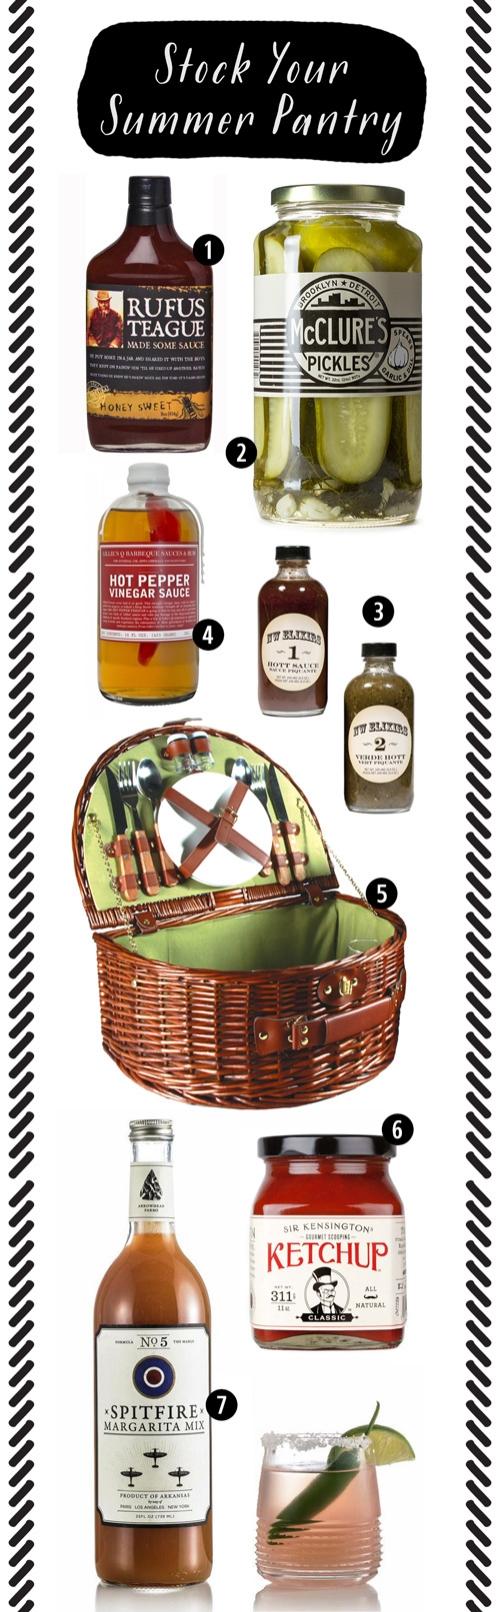 Stocking Your Summer Pantry | SavoryPantryBlog.com